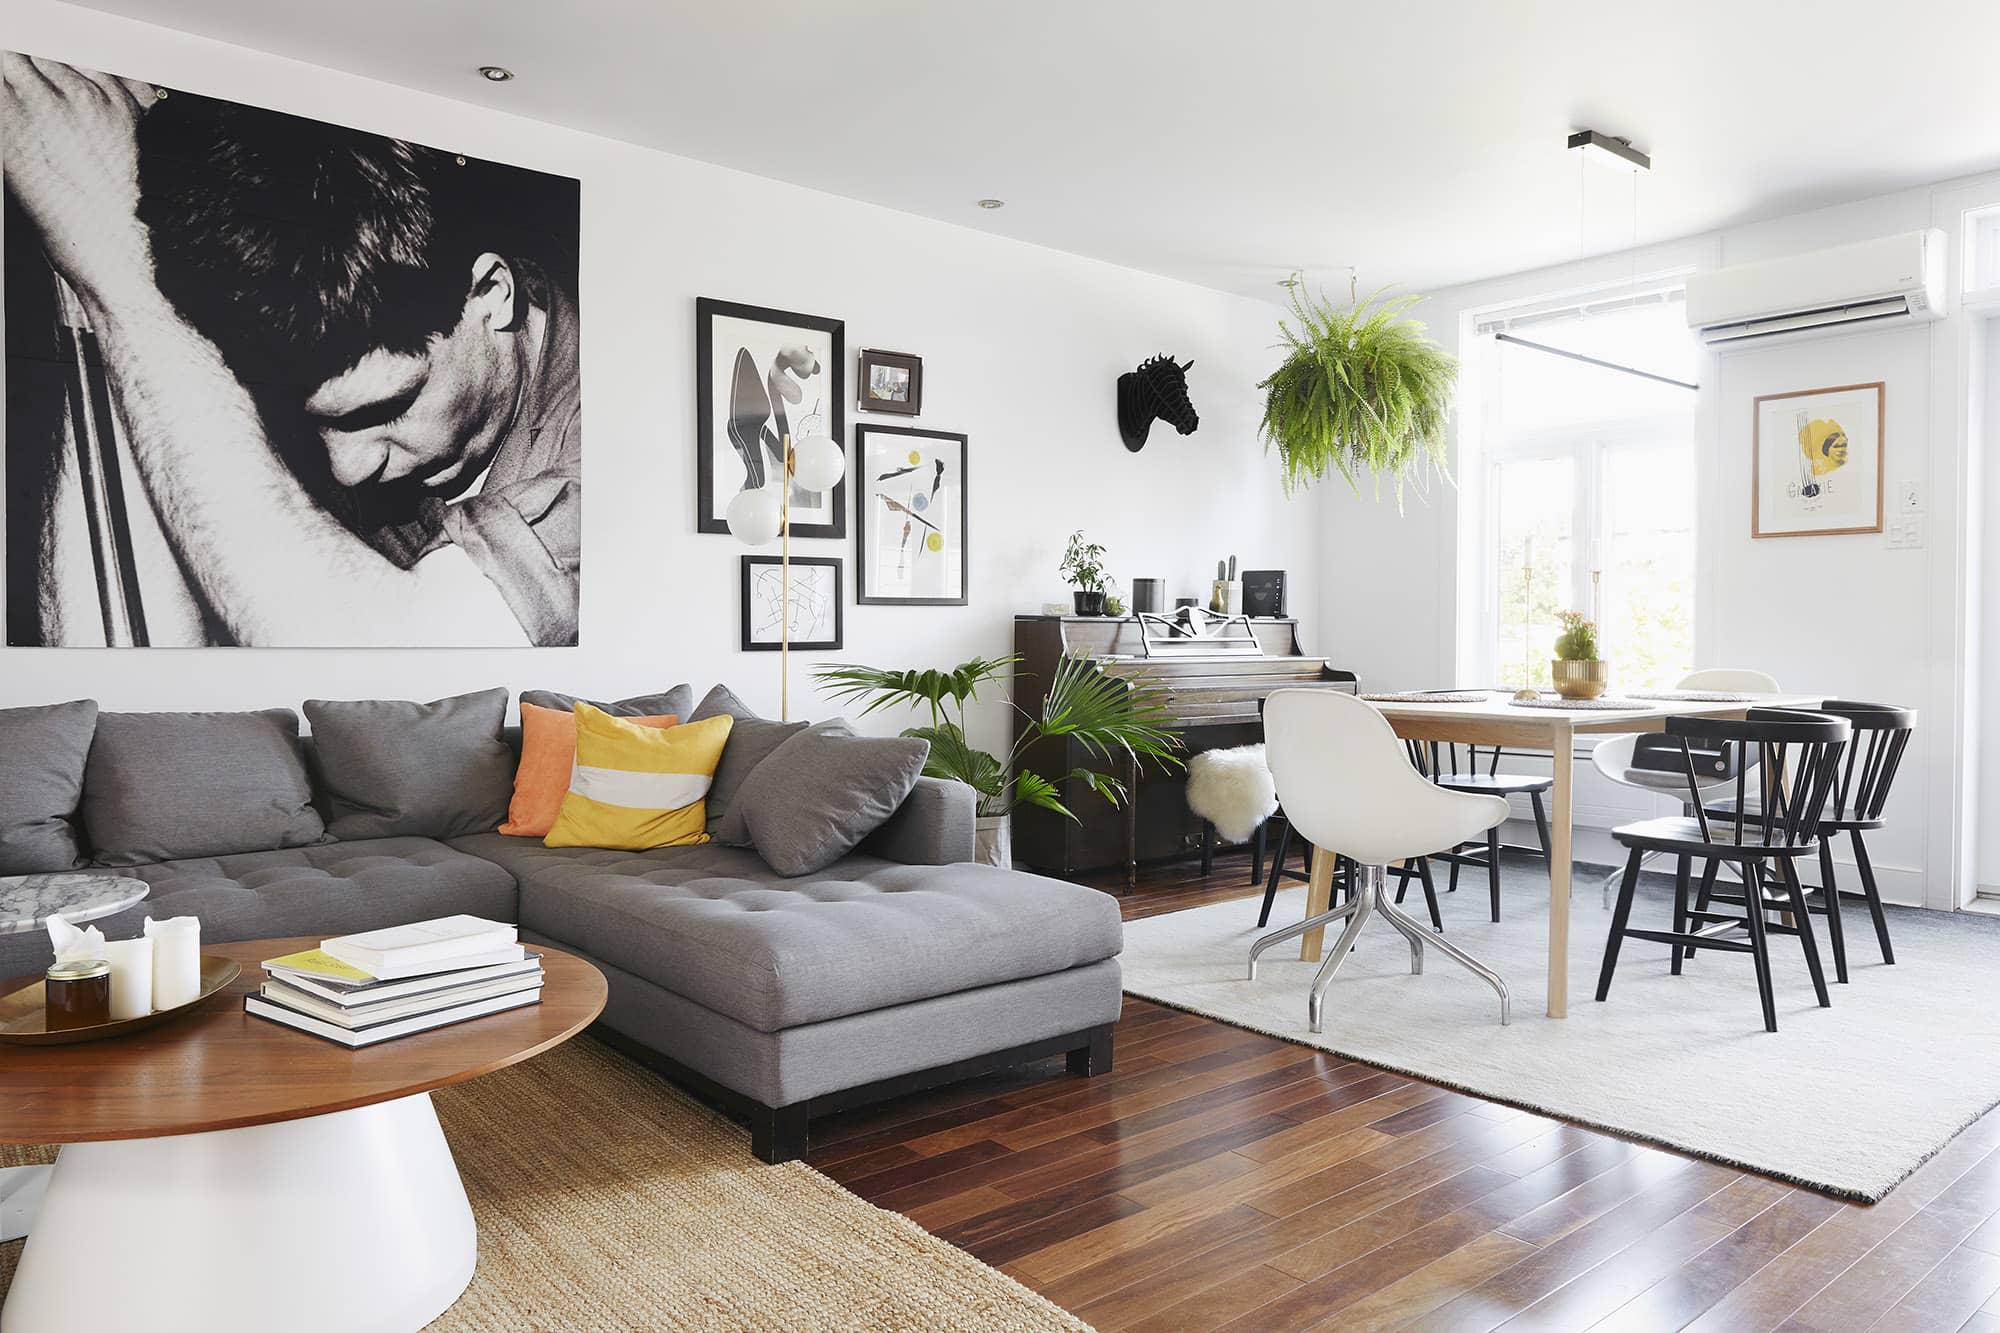 Minimal Modern Decor Ideas in a Montreal Apartment Tour ...